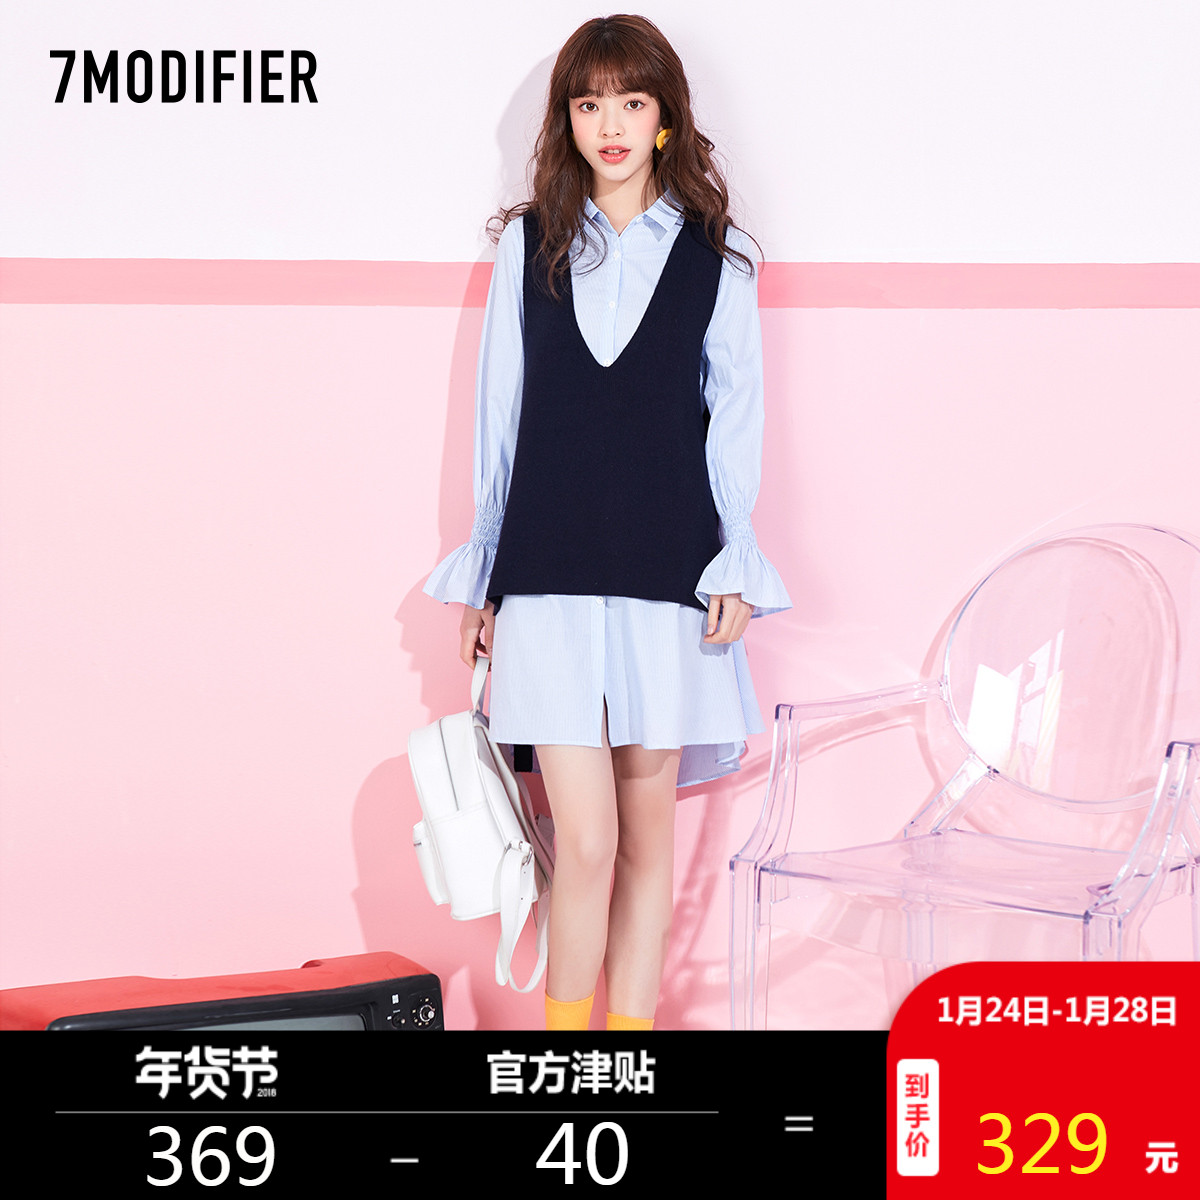 7m2018春新款韩版宽松条纹衬衫A字裙连衣裙毛织马甲背心两件套女